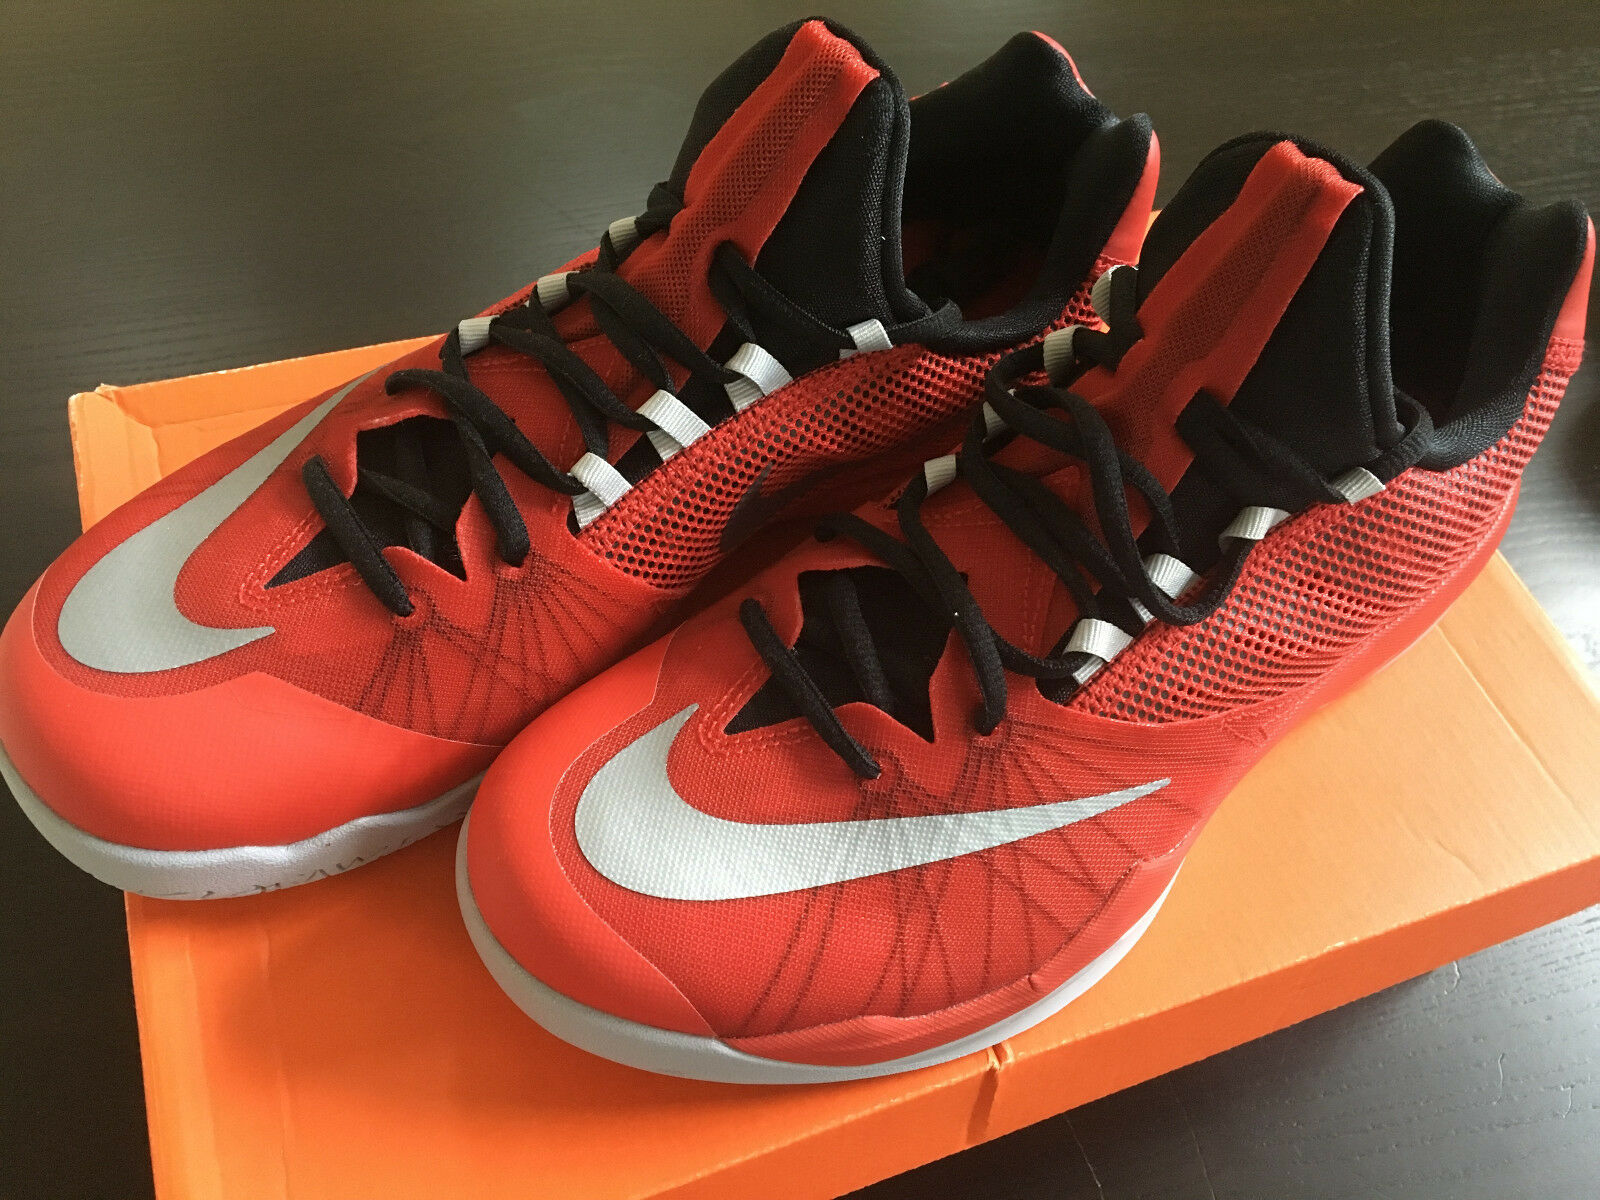 NEW Rare Nike RED ZOOM Run The One Basketball Shoes Low Men Sz 9 harden iguodala